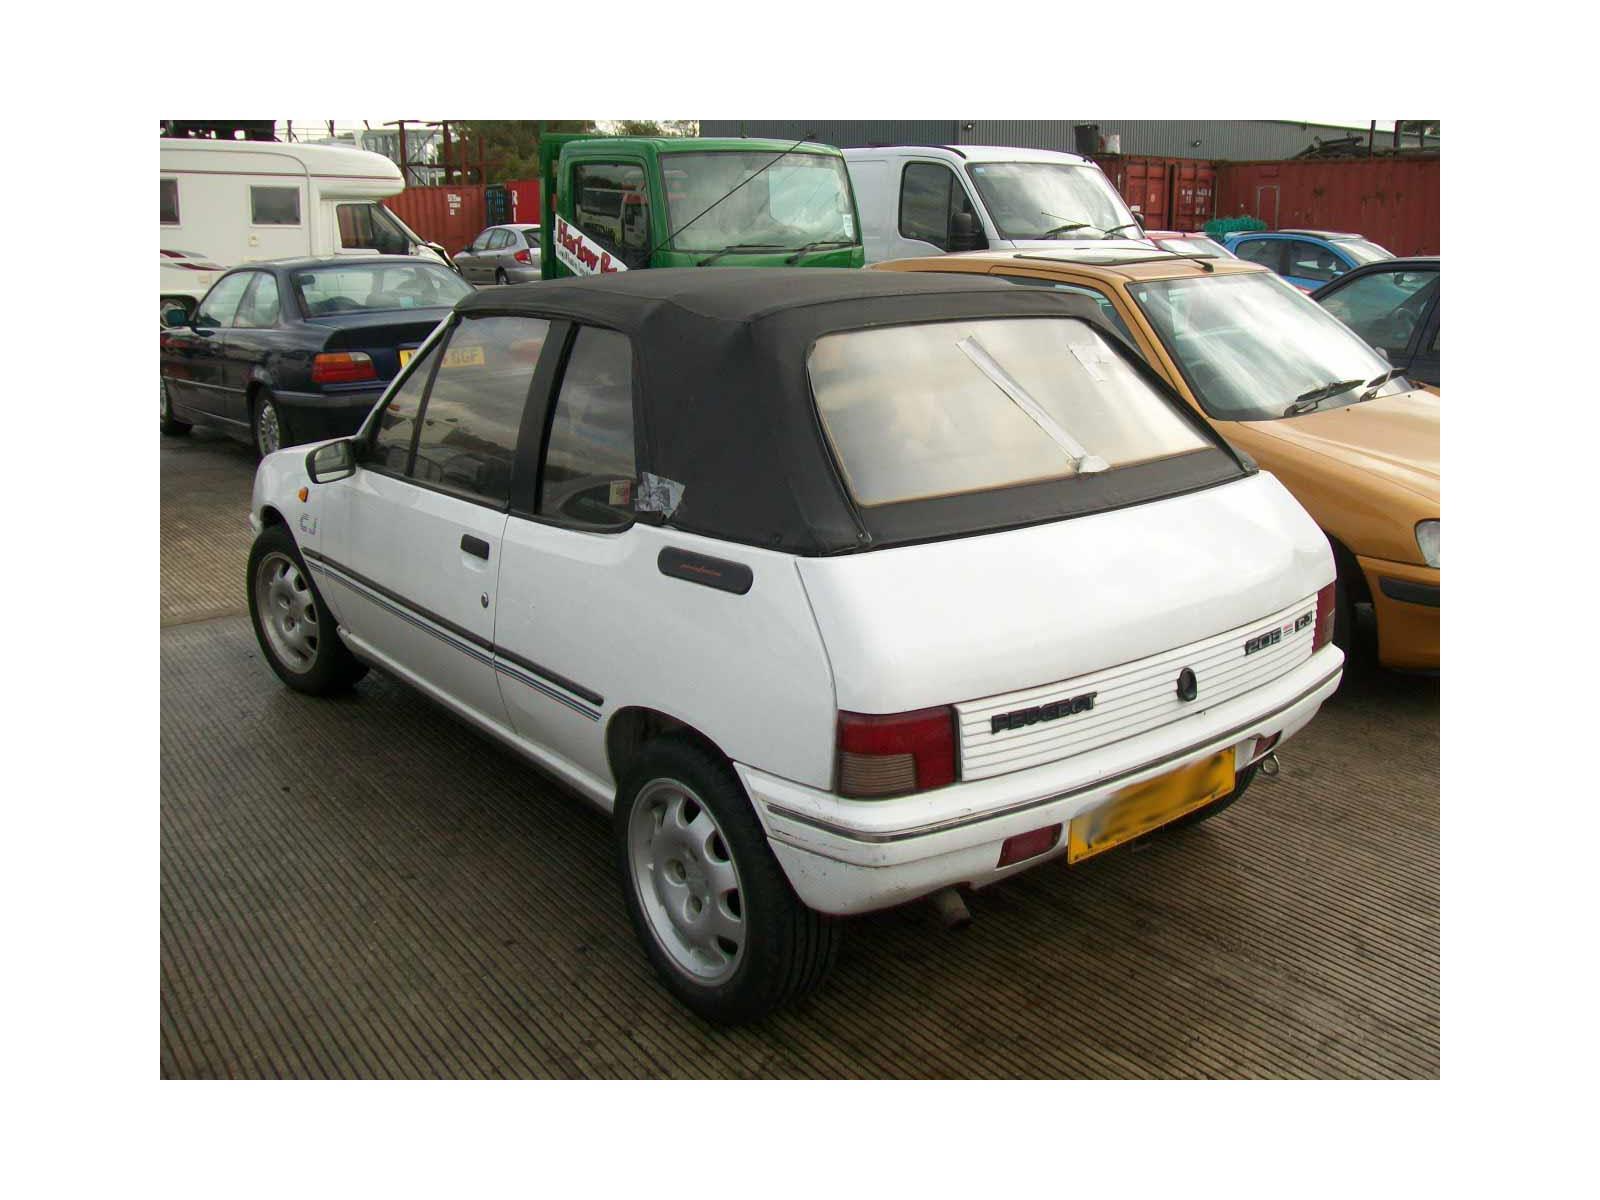 peugeot 205 1988 to 1997 2 door cabriolet petrol manual breaking rh motorhog co uk Peugeot 204 manual instrucciones peugeot 205 mito